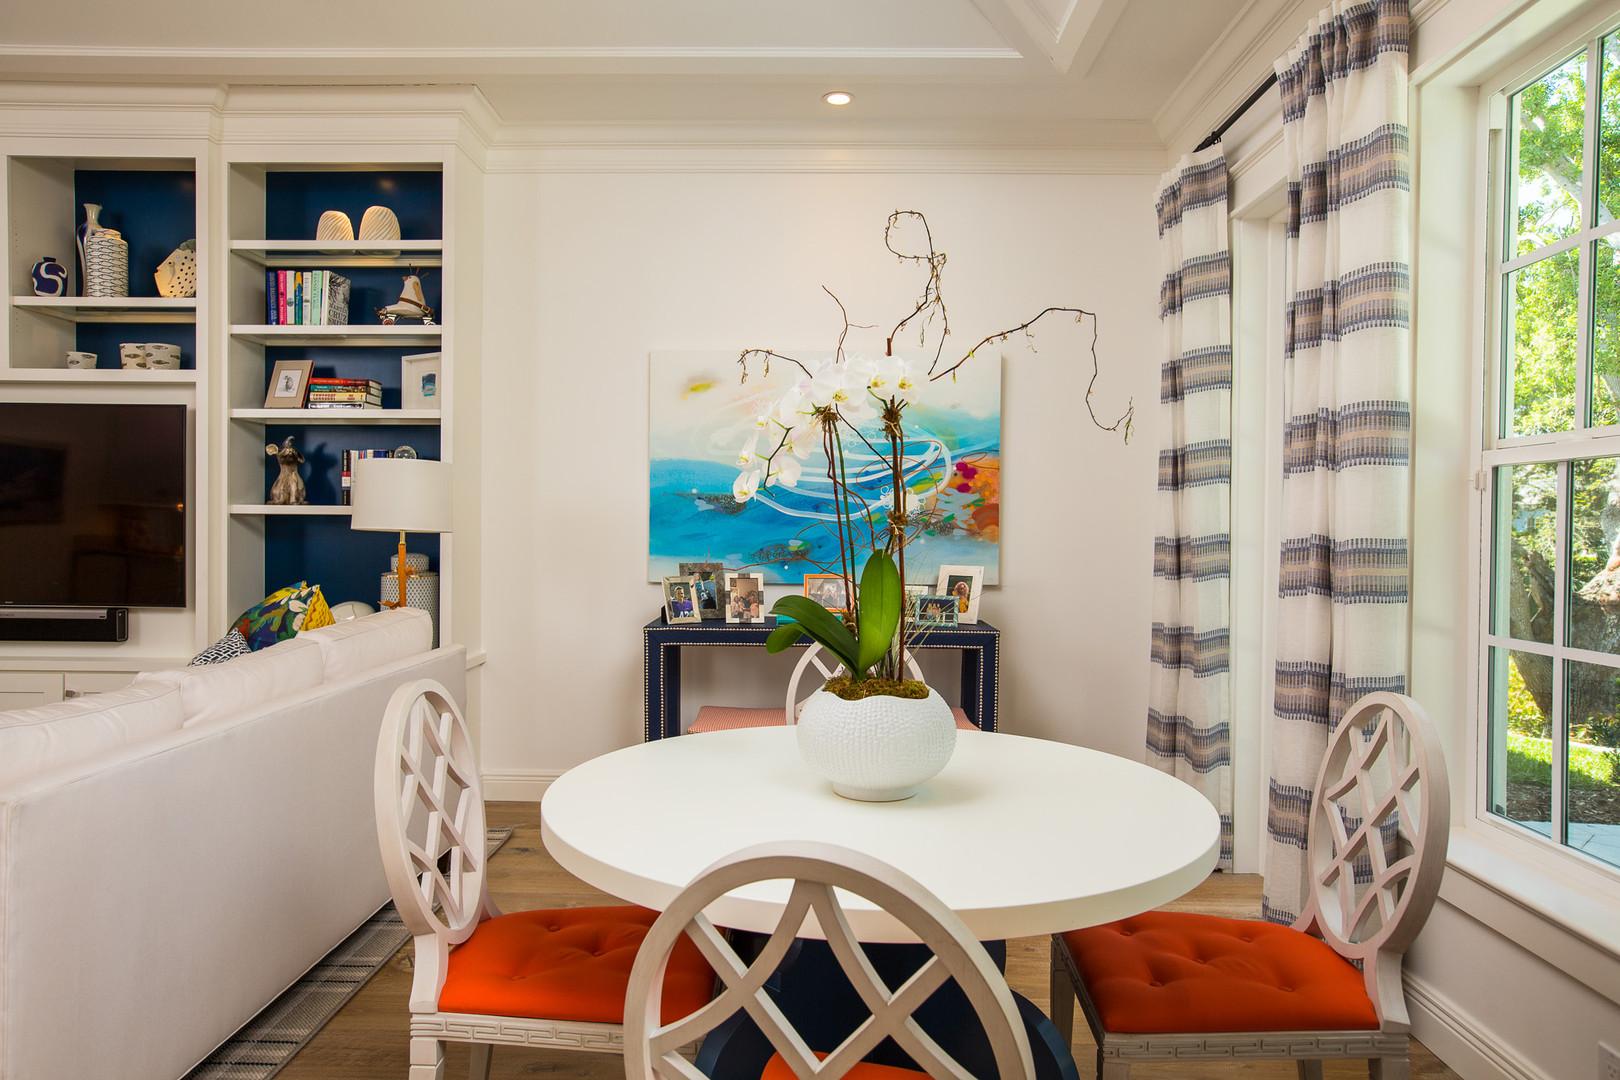 Breakfast Room in Vero Beach by Interior Designer Tiffany Sweeney Decor Envy 10